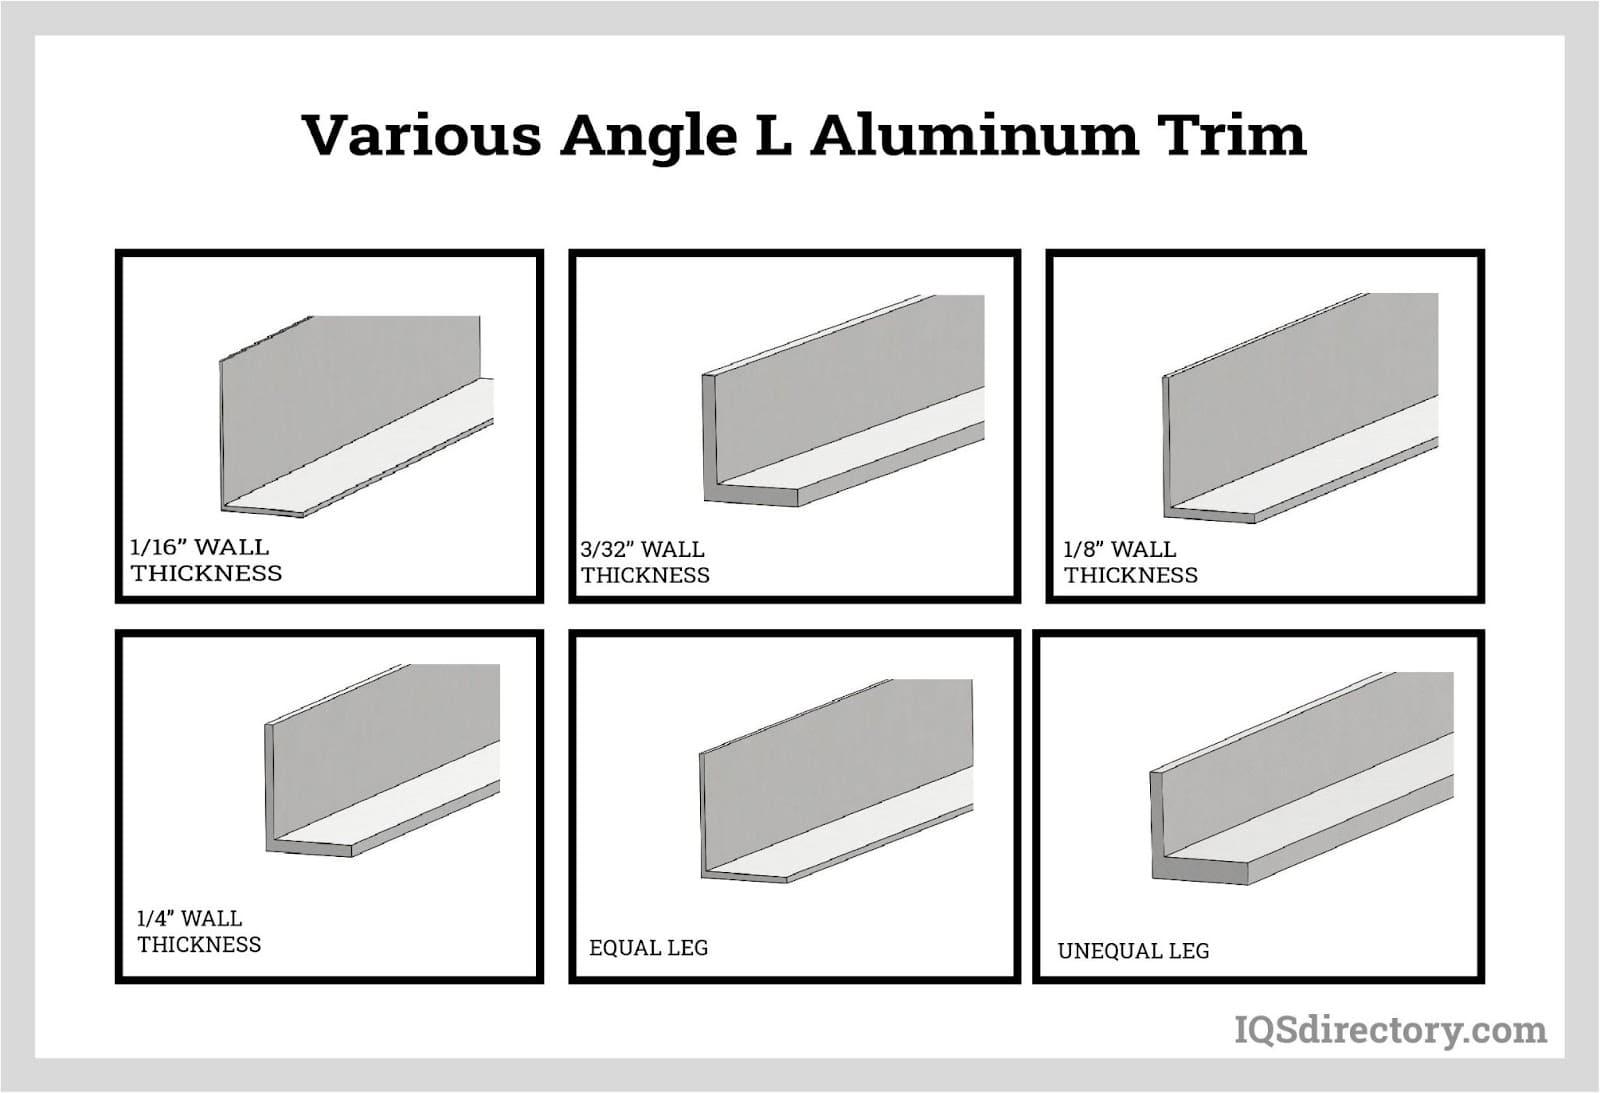 Various Angle L Aluminum Trim